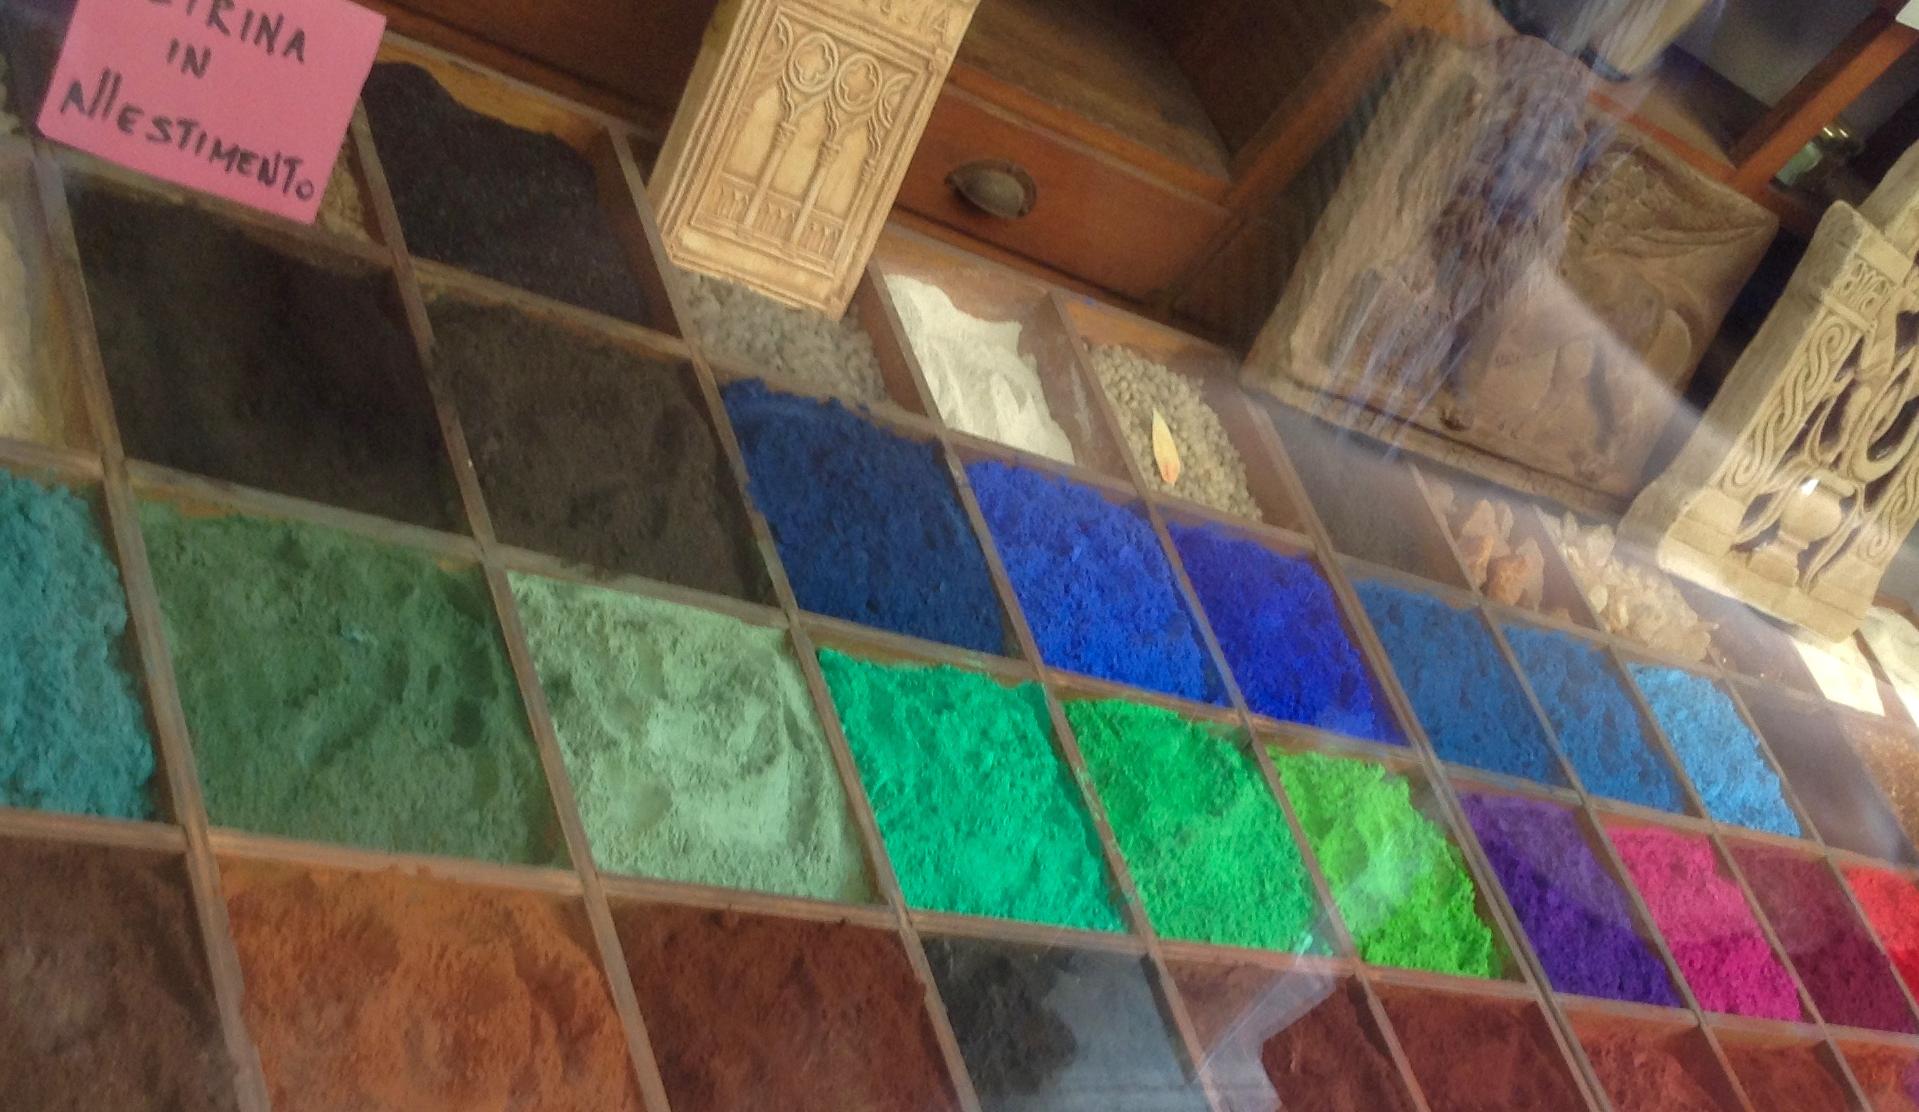 Pigments in a shop window. (photo: Jessica Jones)